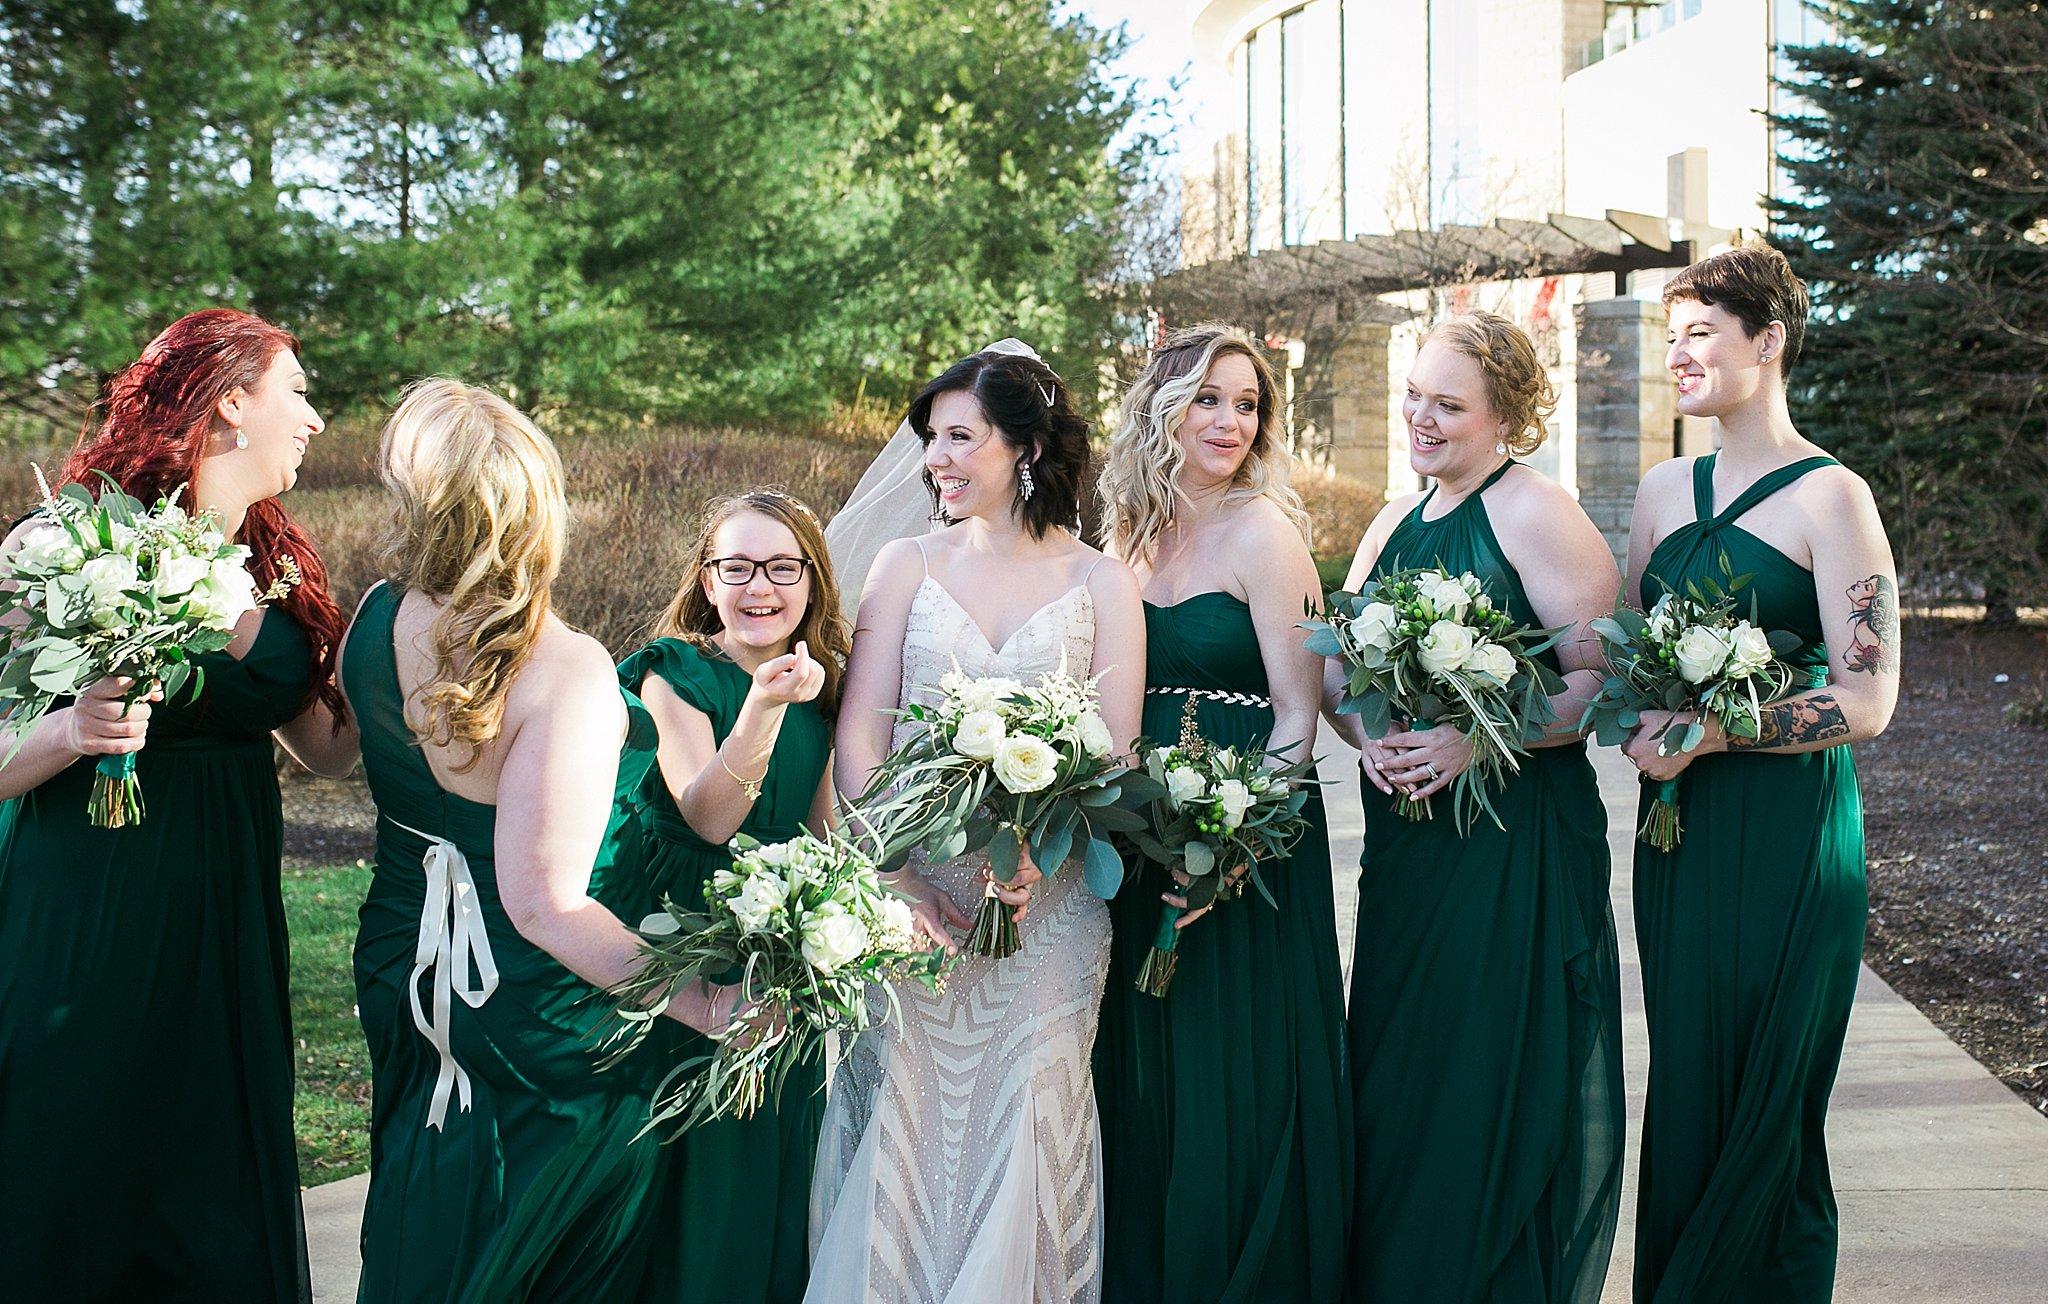 Foxwoods Wedding Connecticut Wedding Photographer Sweet Alice Photography37.jpg